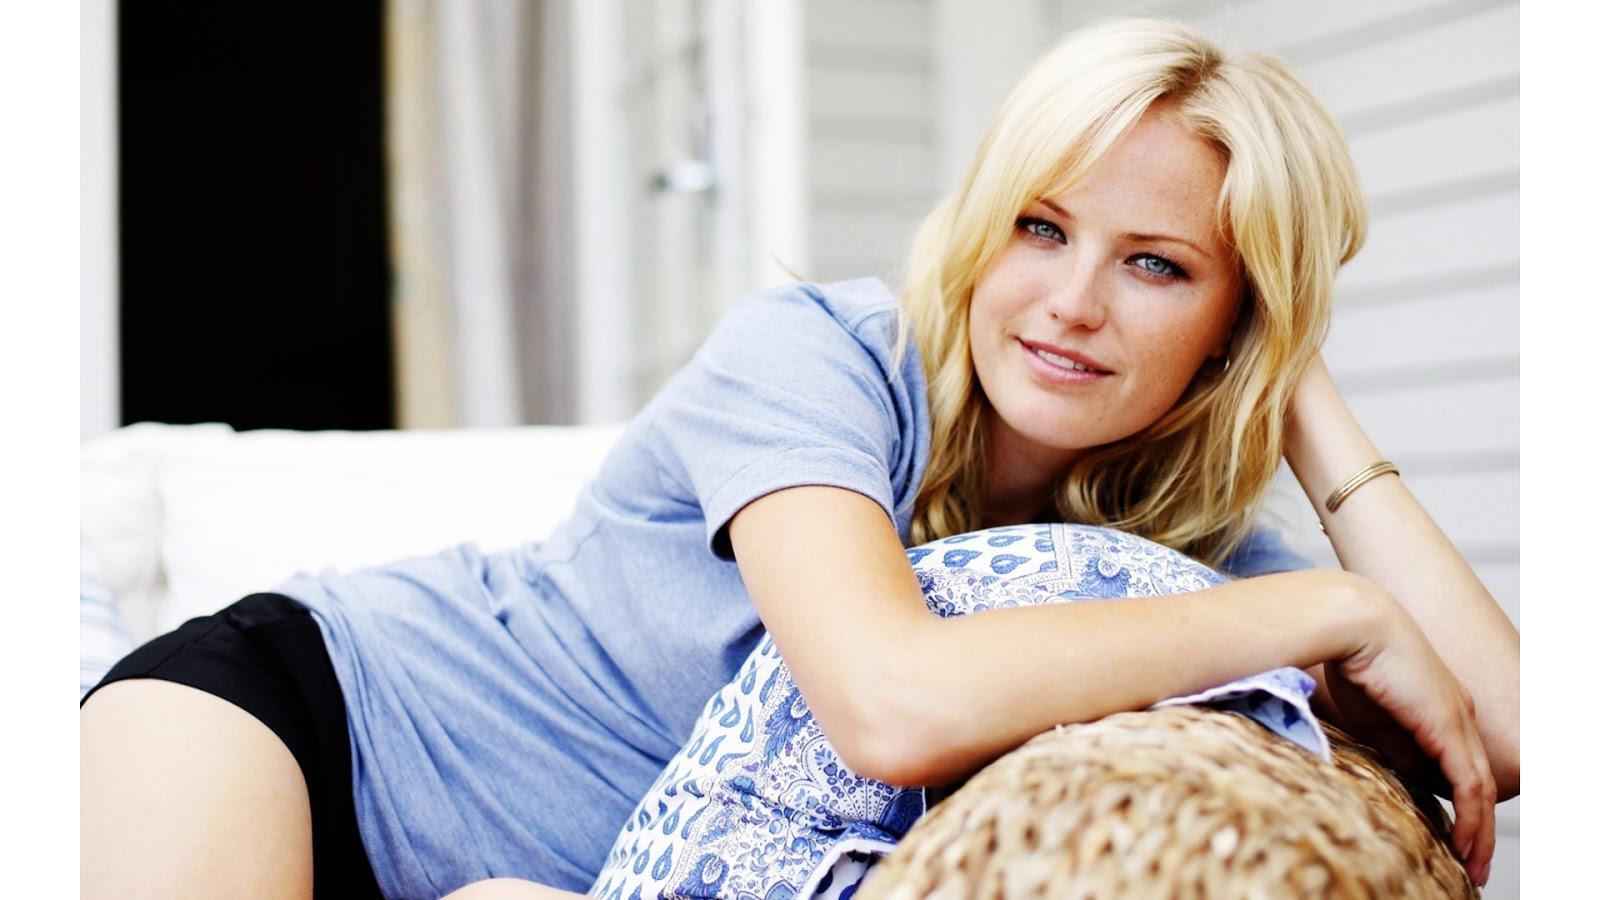 Hd wallpapers world hollywood actress full hd wallpapers - Hollywood actress full hd images ...